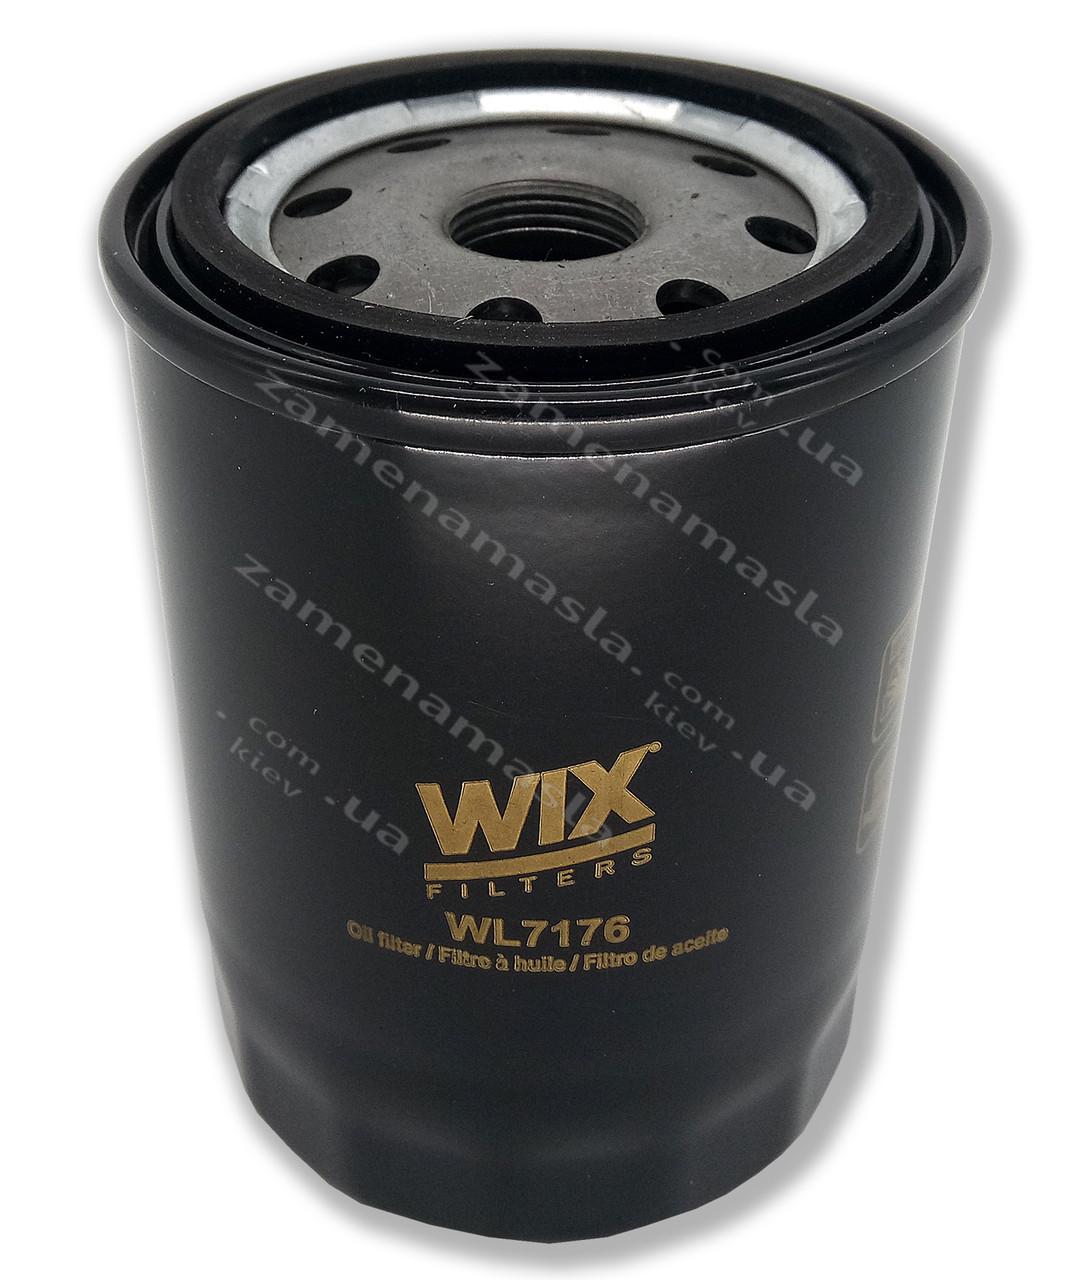 WIX WL7176 аналог SM-187 на Leyland-Daf; Aro; Citroën; Landrover Range Rover